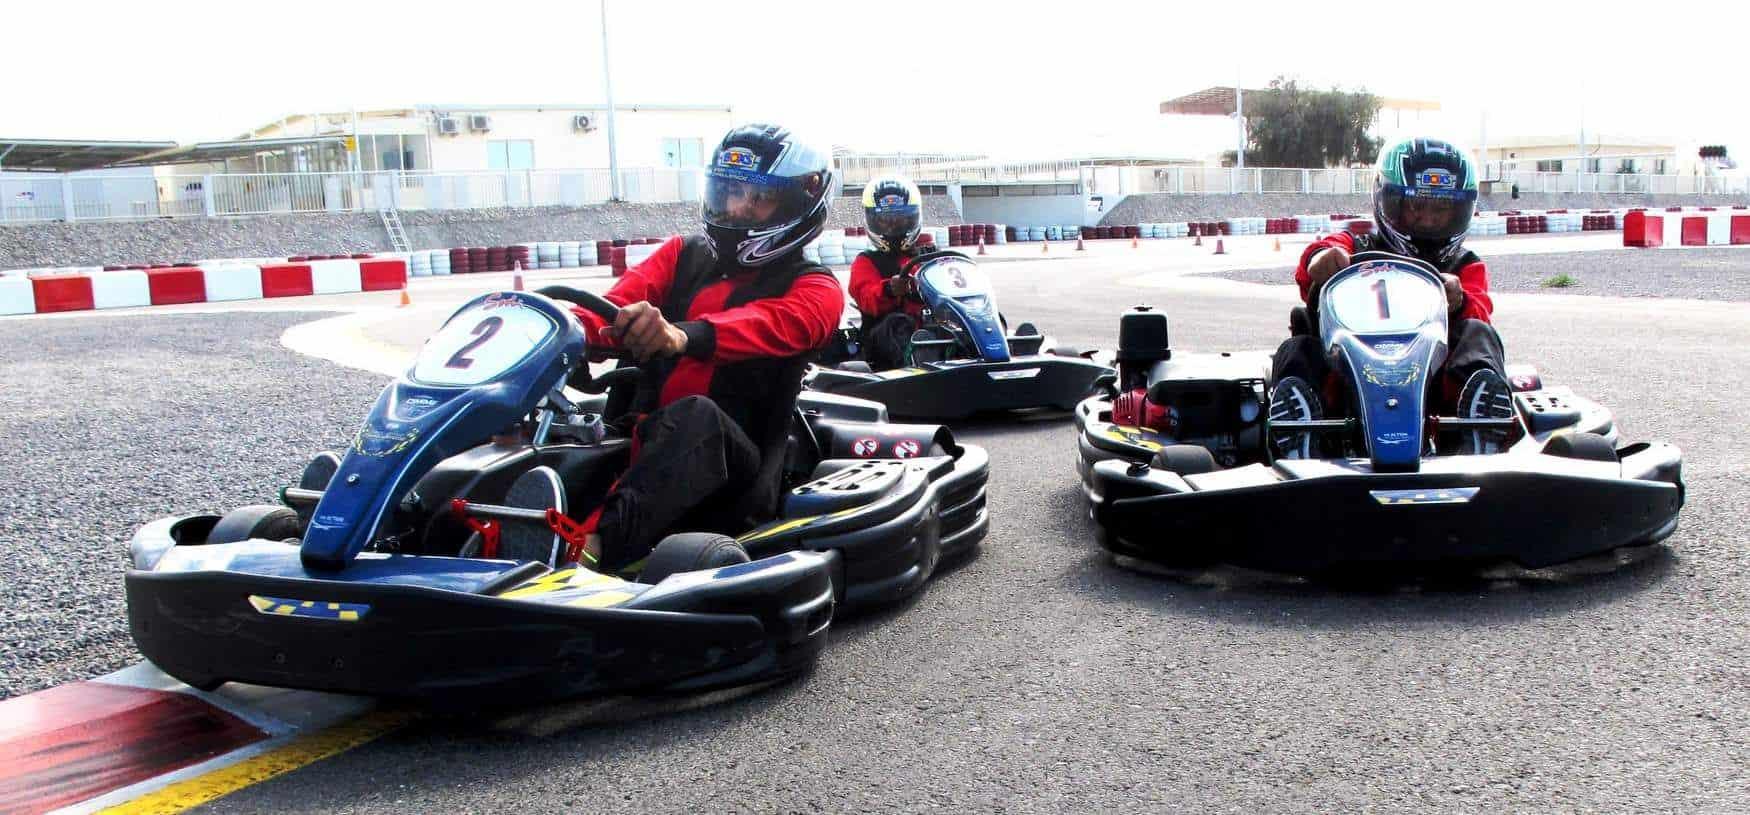 RAK Track - Ras Al-Khaimah Only Outdoor Karting Facility